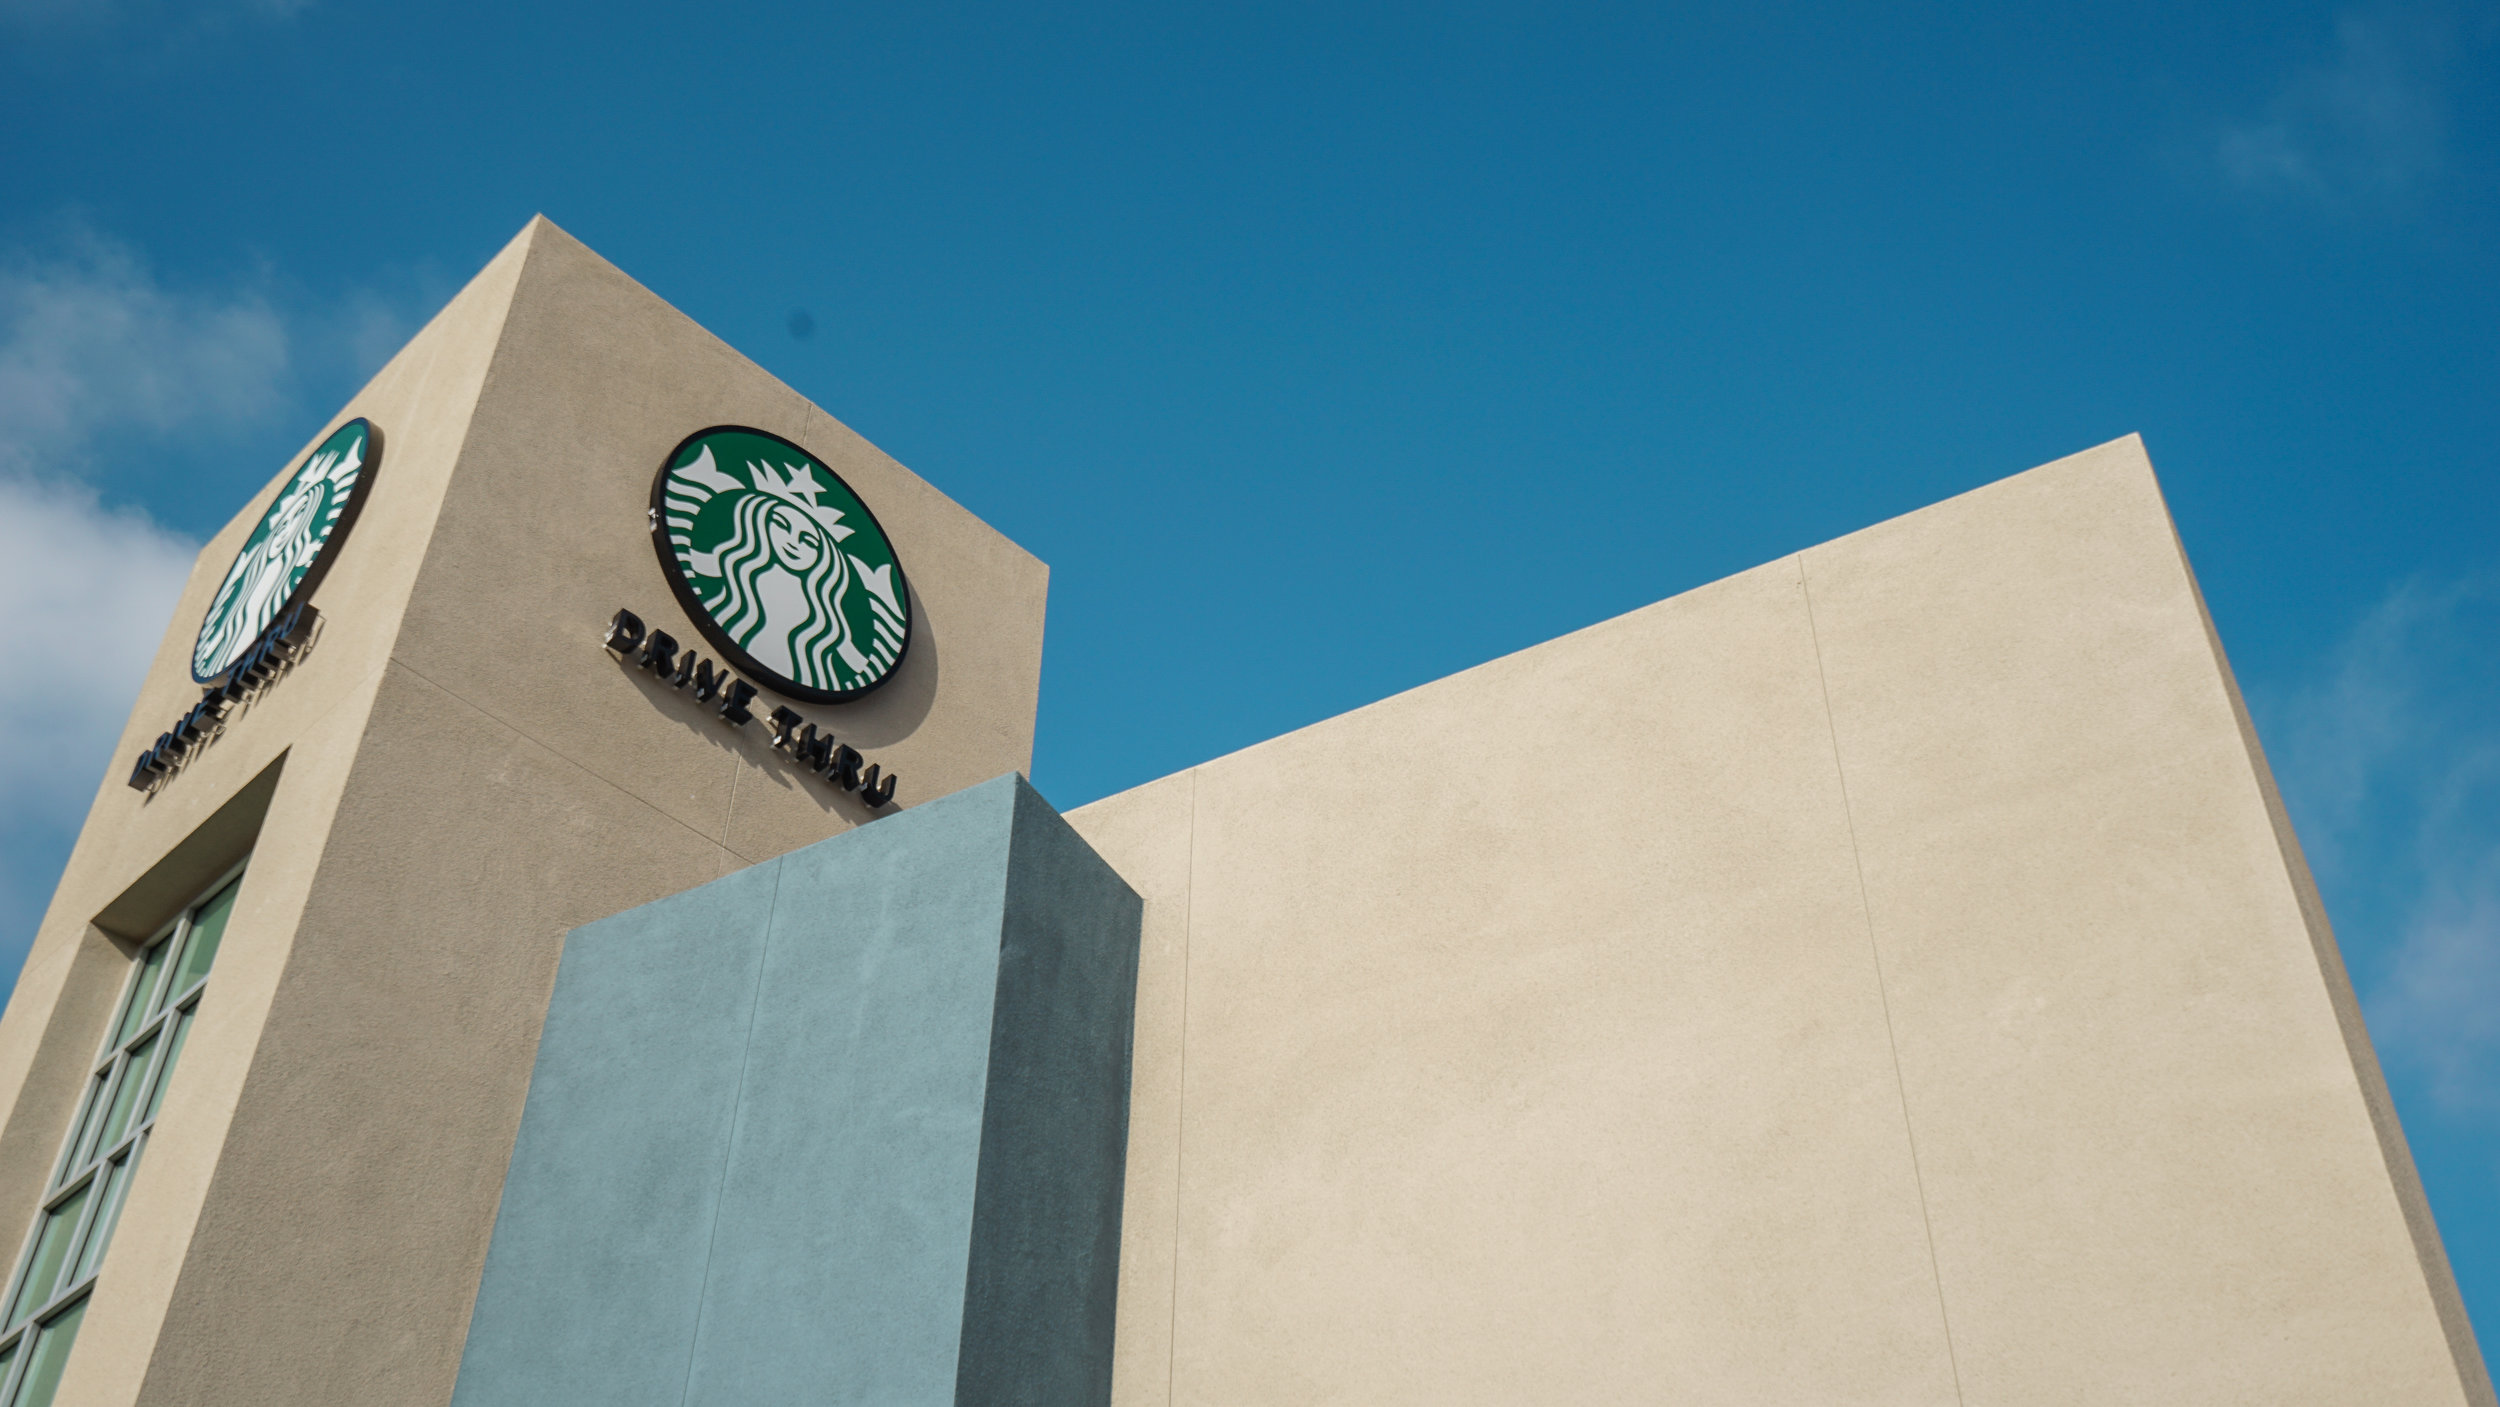 Starbucks built by K.D. Stahl Construction